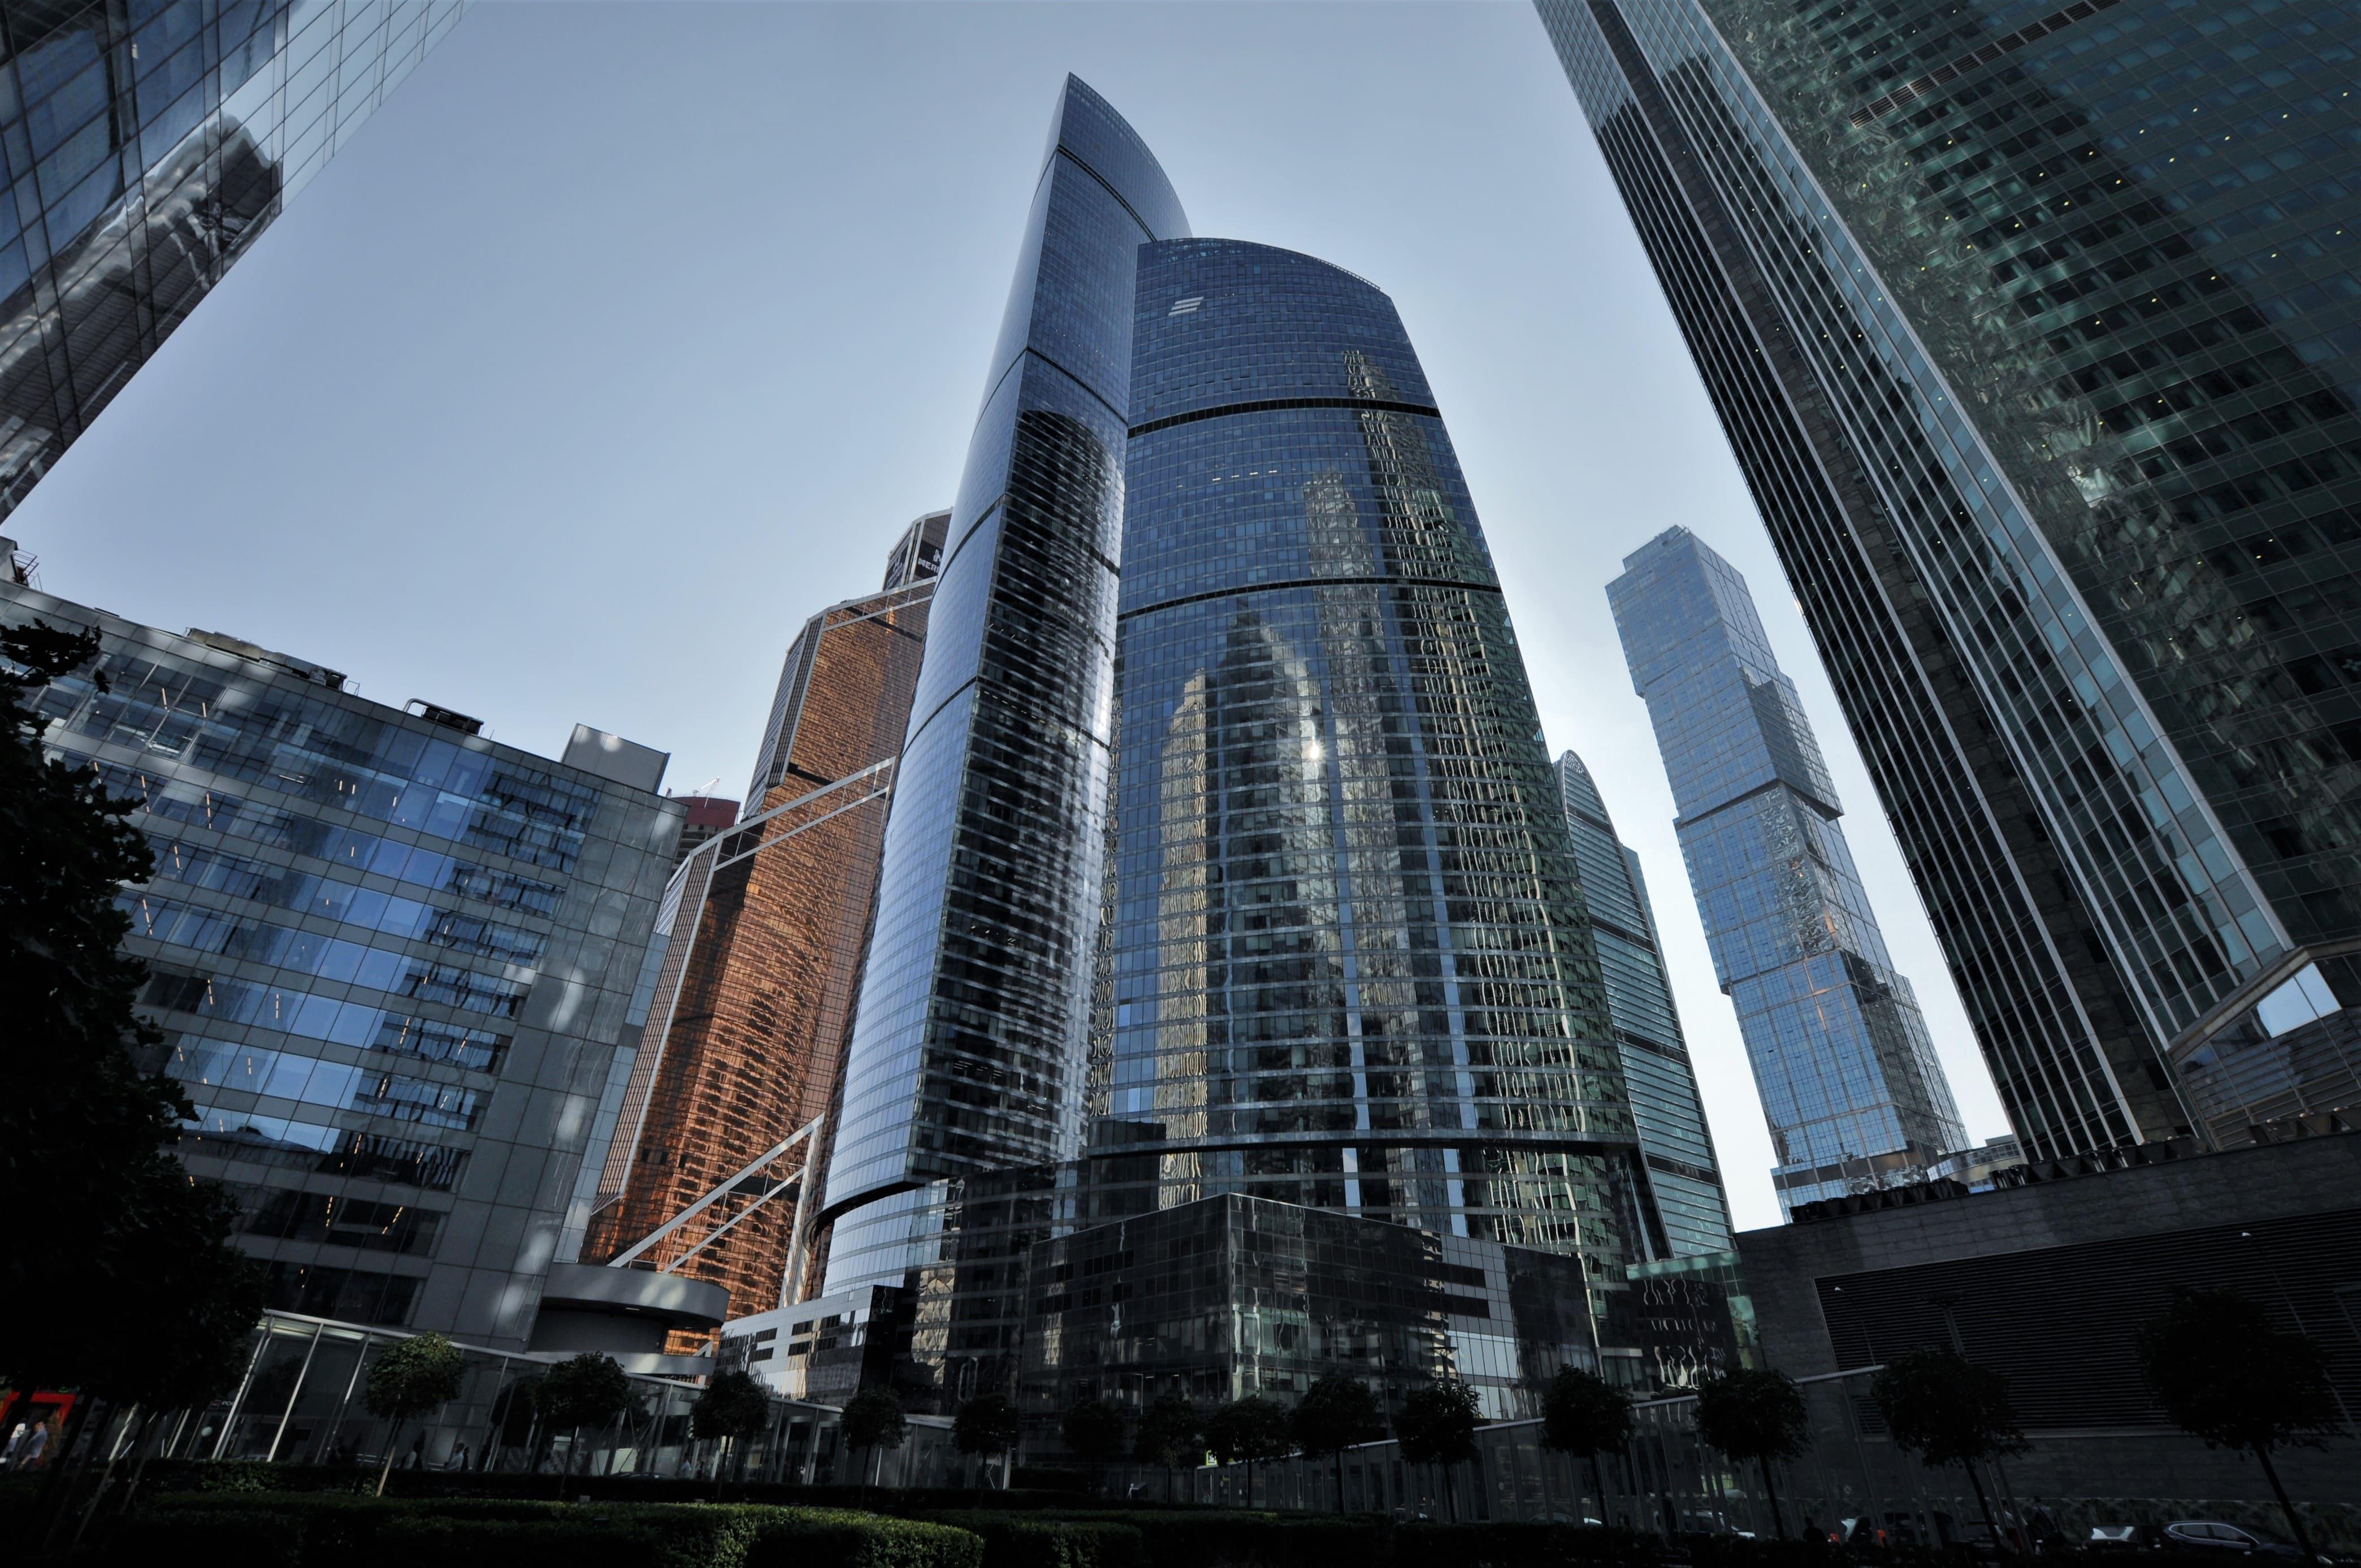 Офисы Москва Сити башня федерация восток